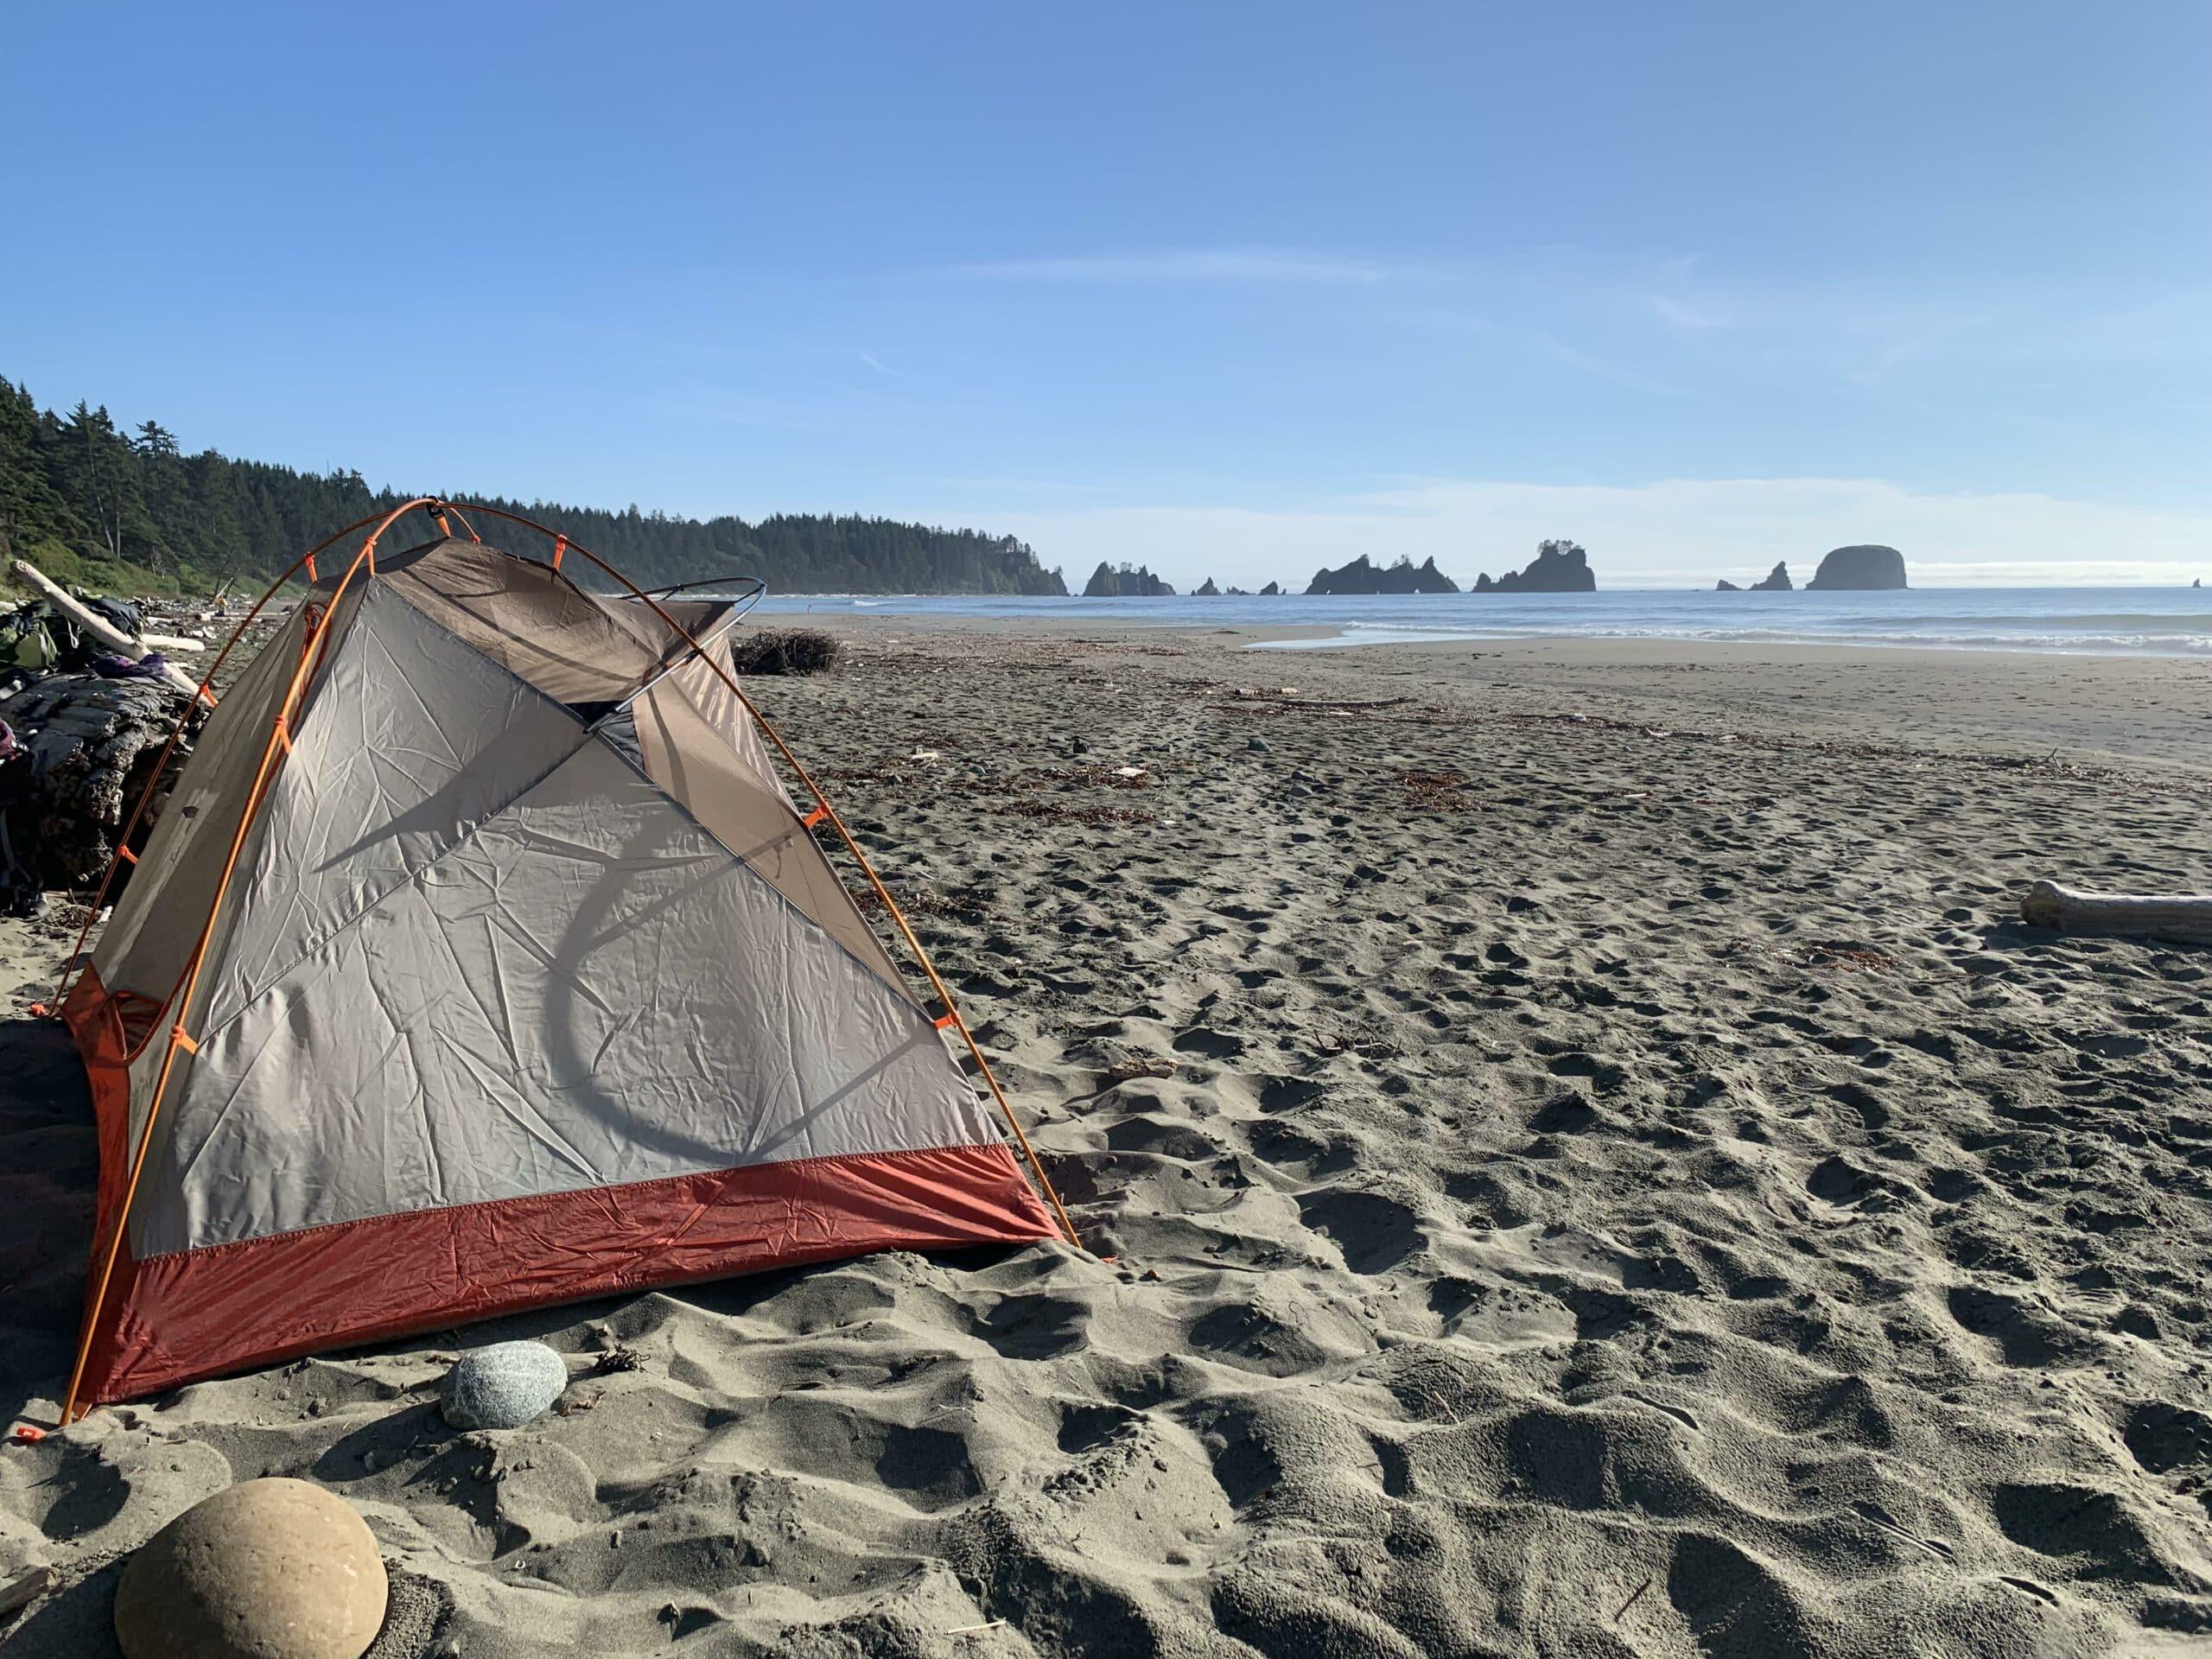 Pilih-Bahan-dan-Juga-Warna-Tenda-yang-Dapat-Menahan-Sinar-Matahari